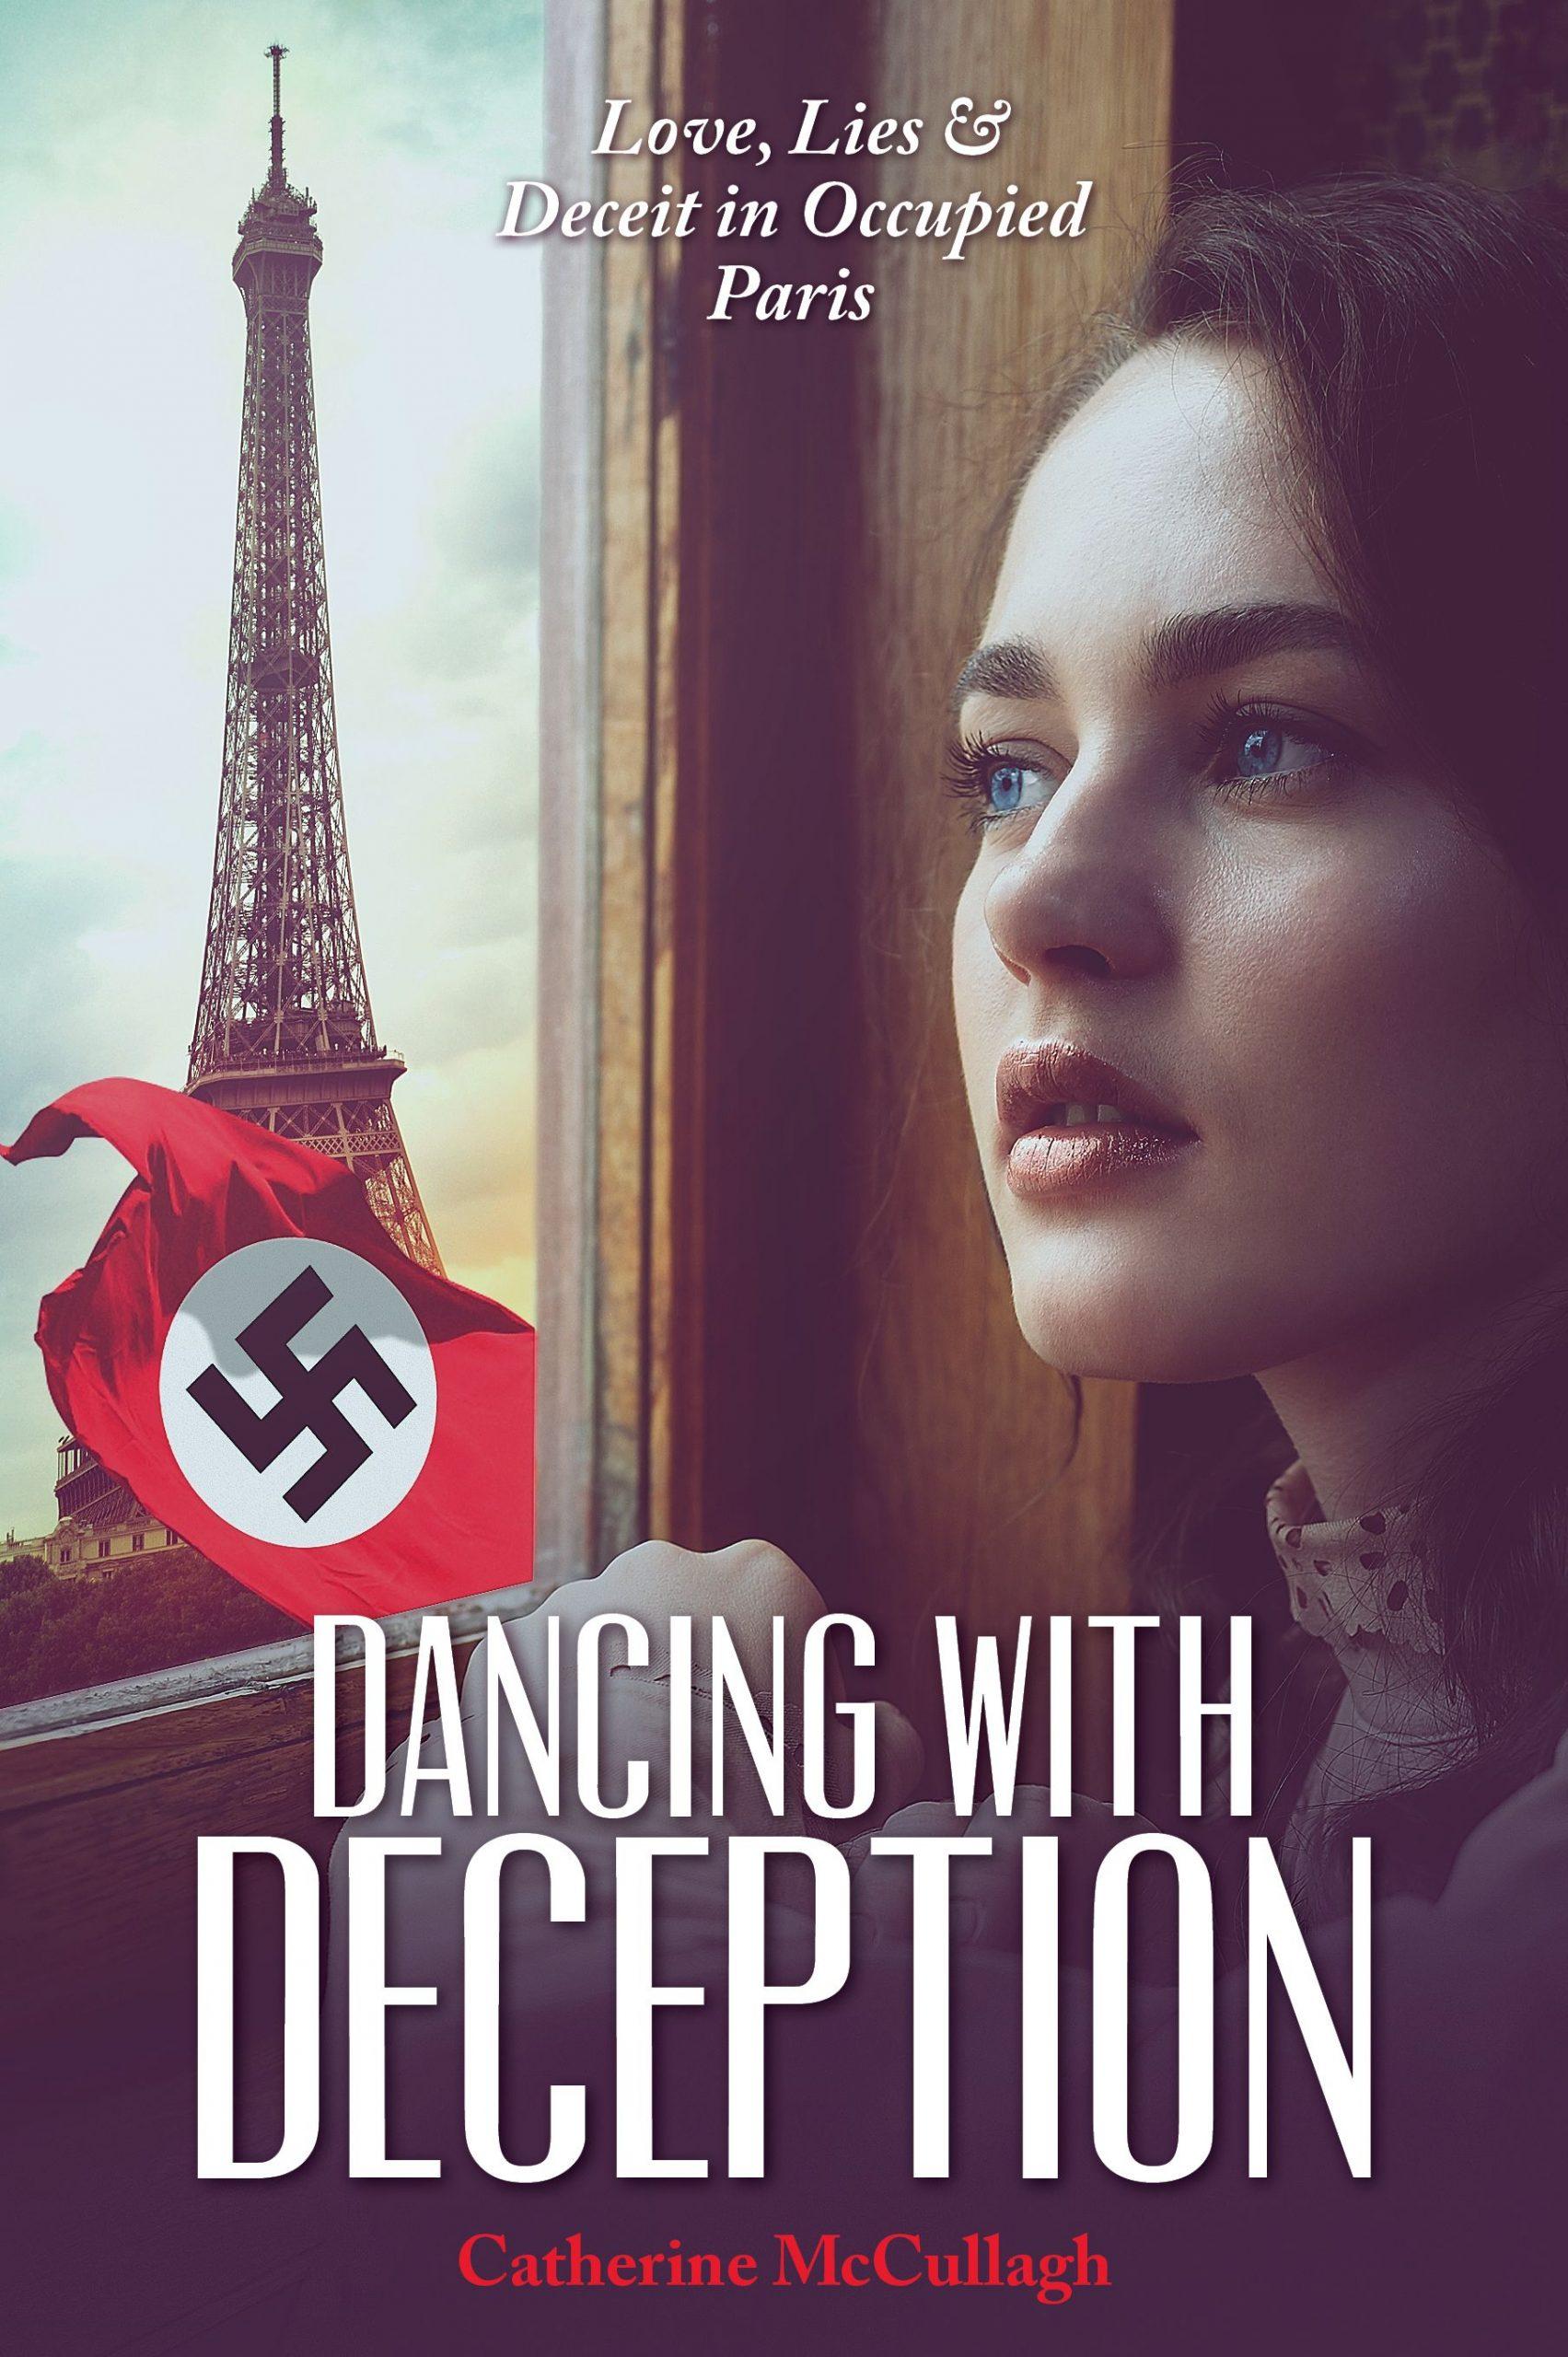 Dancing with Deception – Love, Lies & Deception